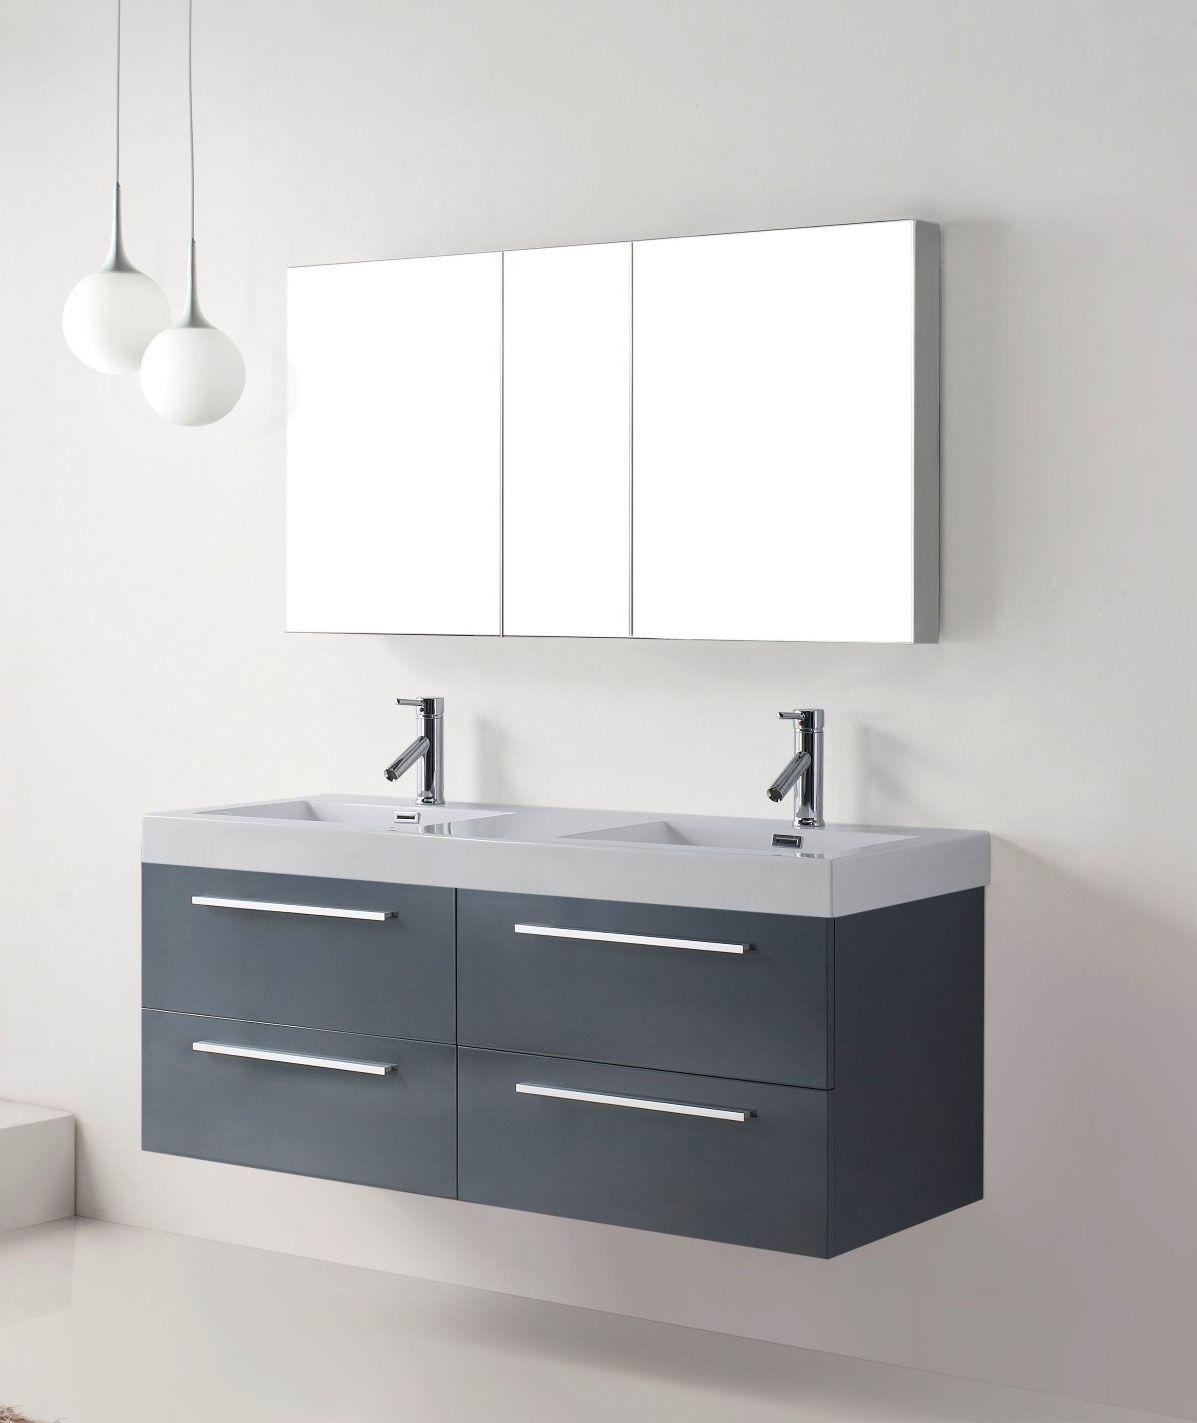 54 Inch Modern Double Sink Bathroom Vanity In Grey Finish Bathroom